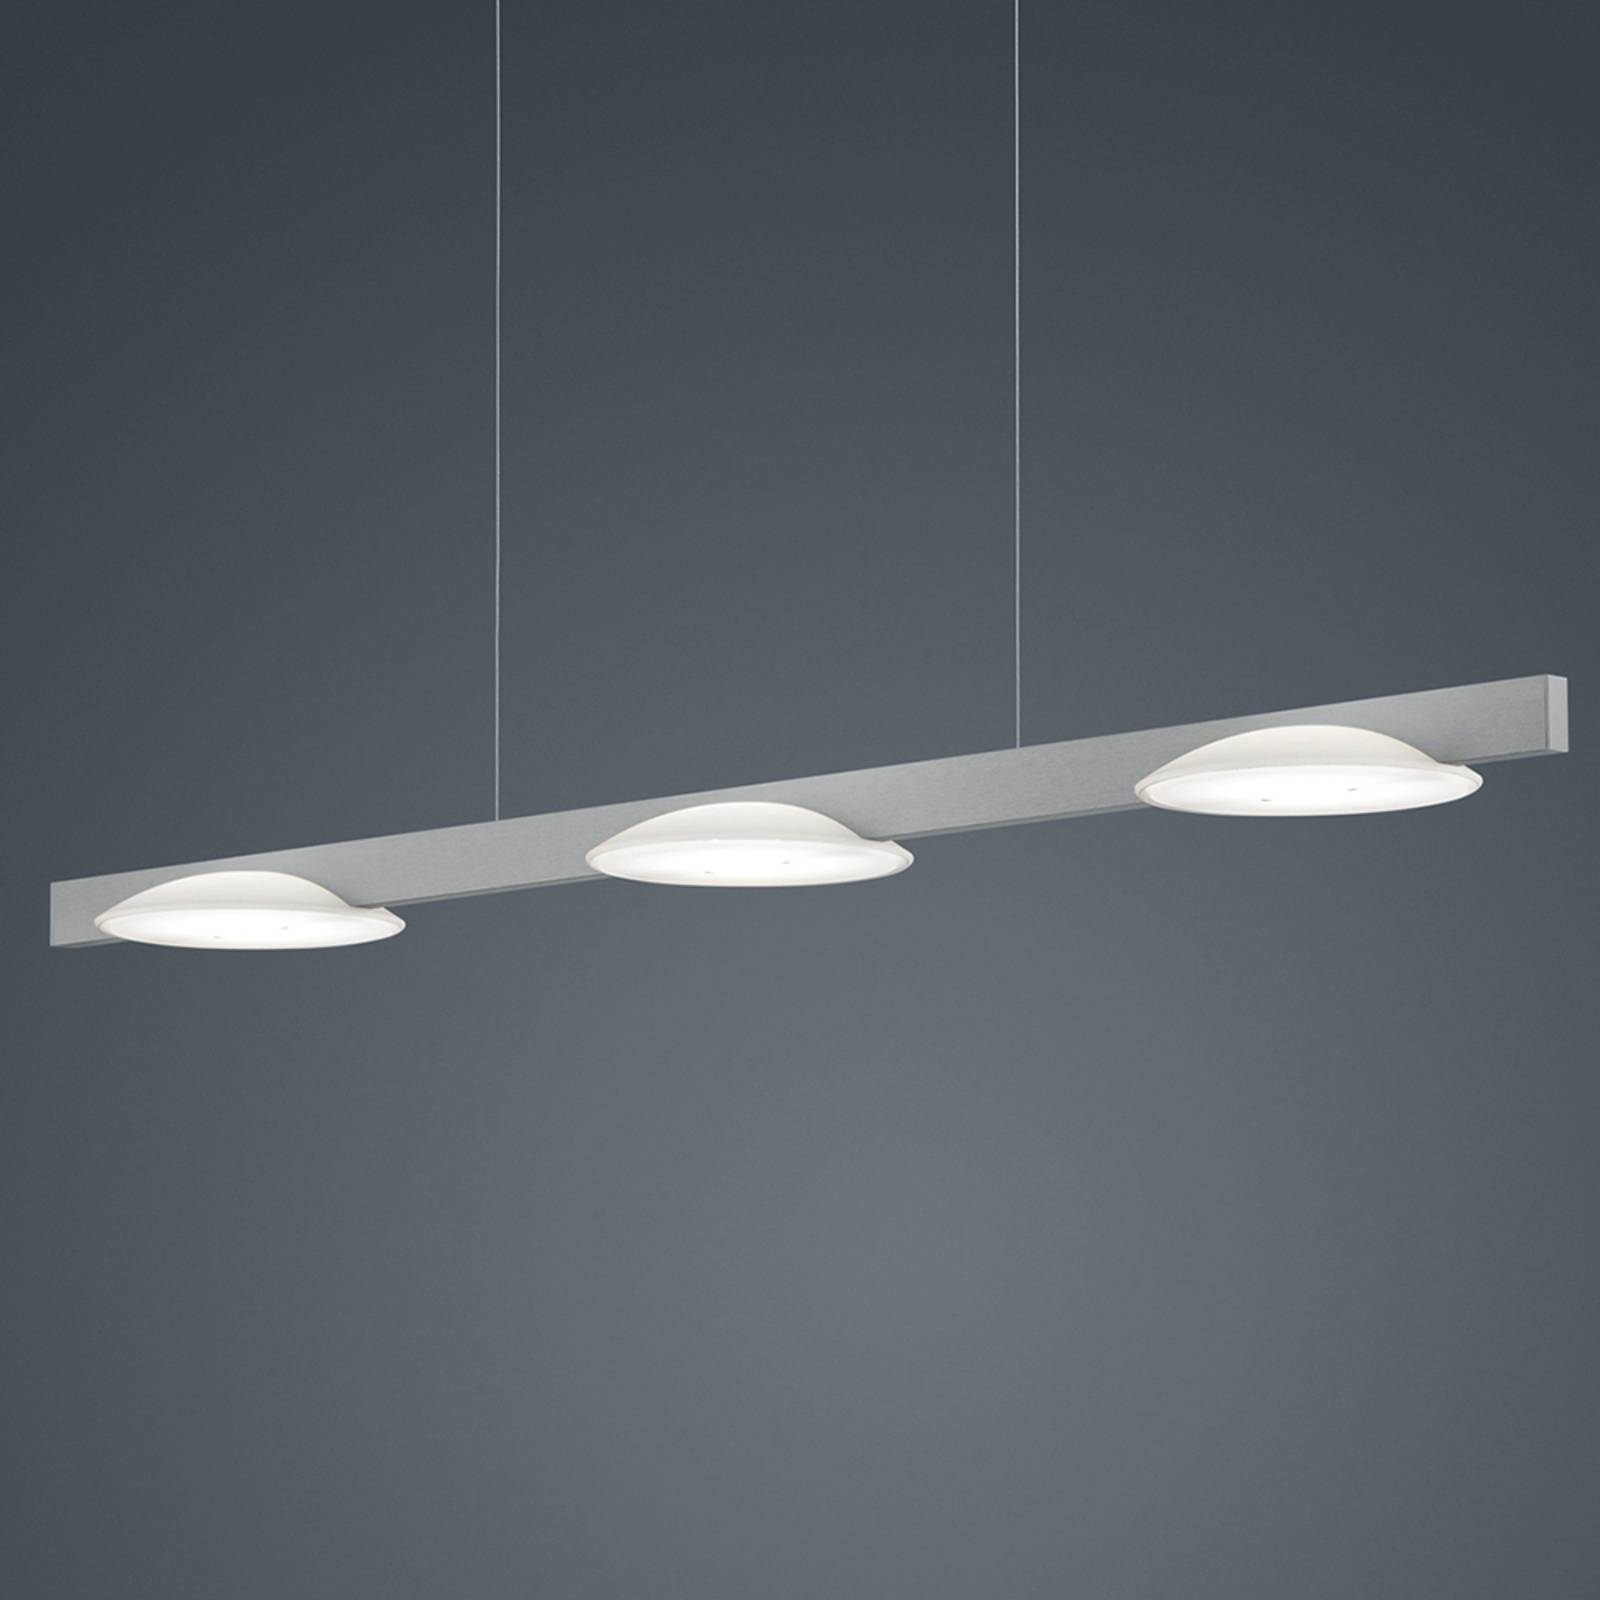 Helestra Pole lampa wisząca LED 3-pkt. niklowa